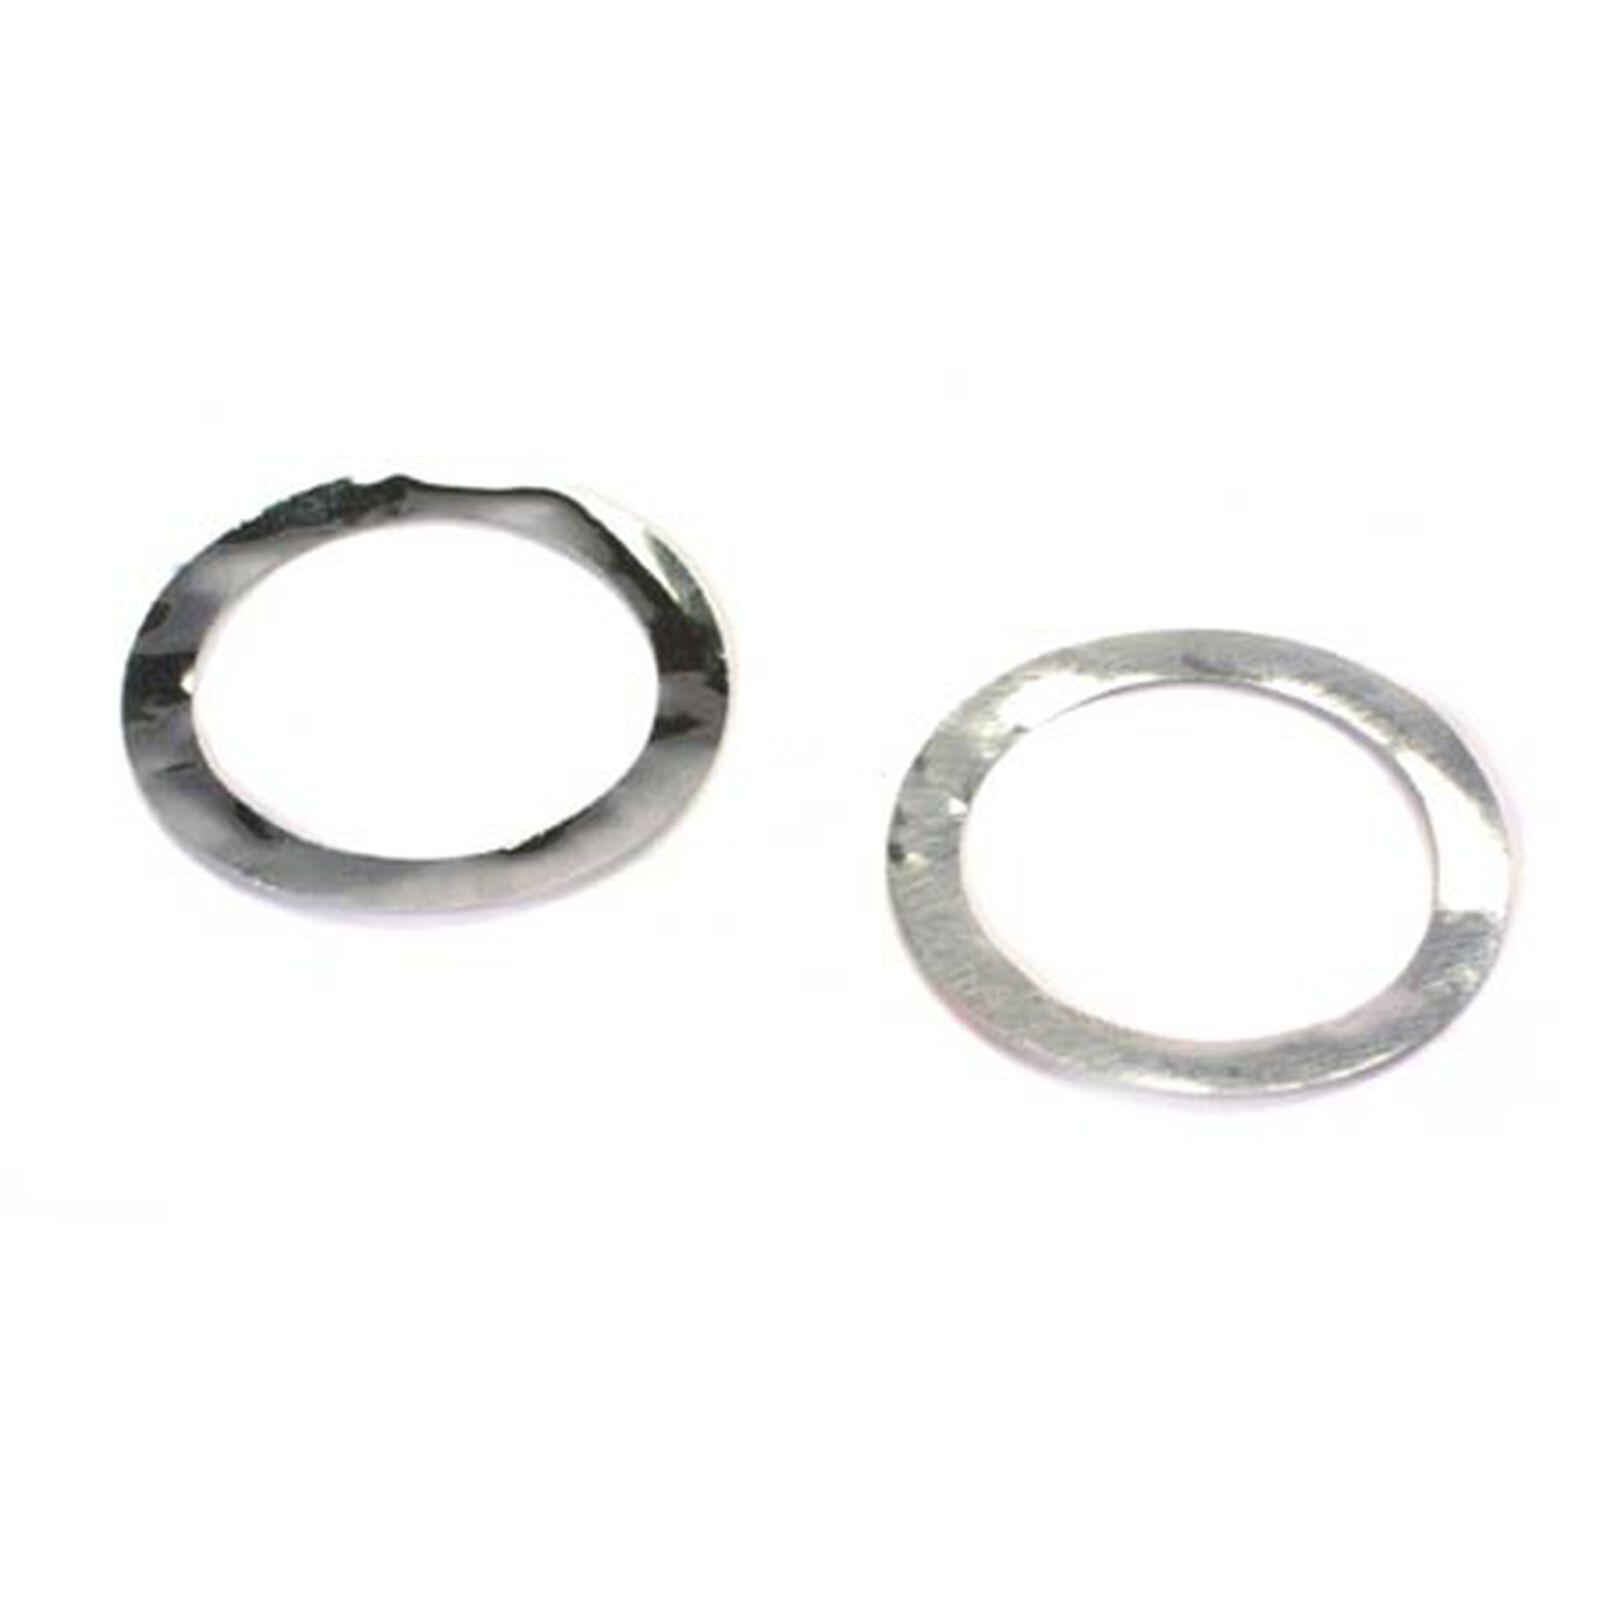 Cylinder Head Shim-S46112:A